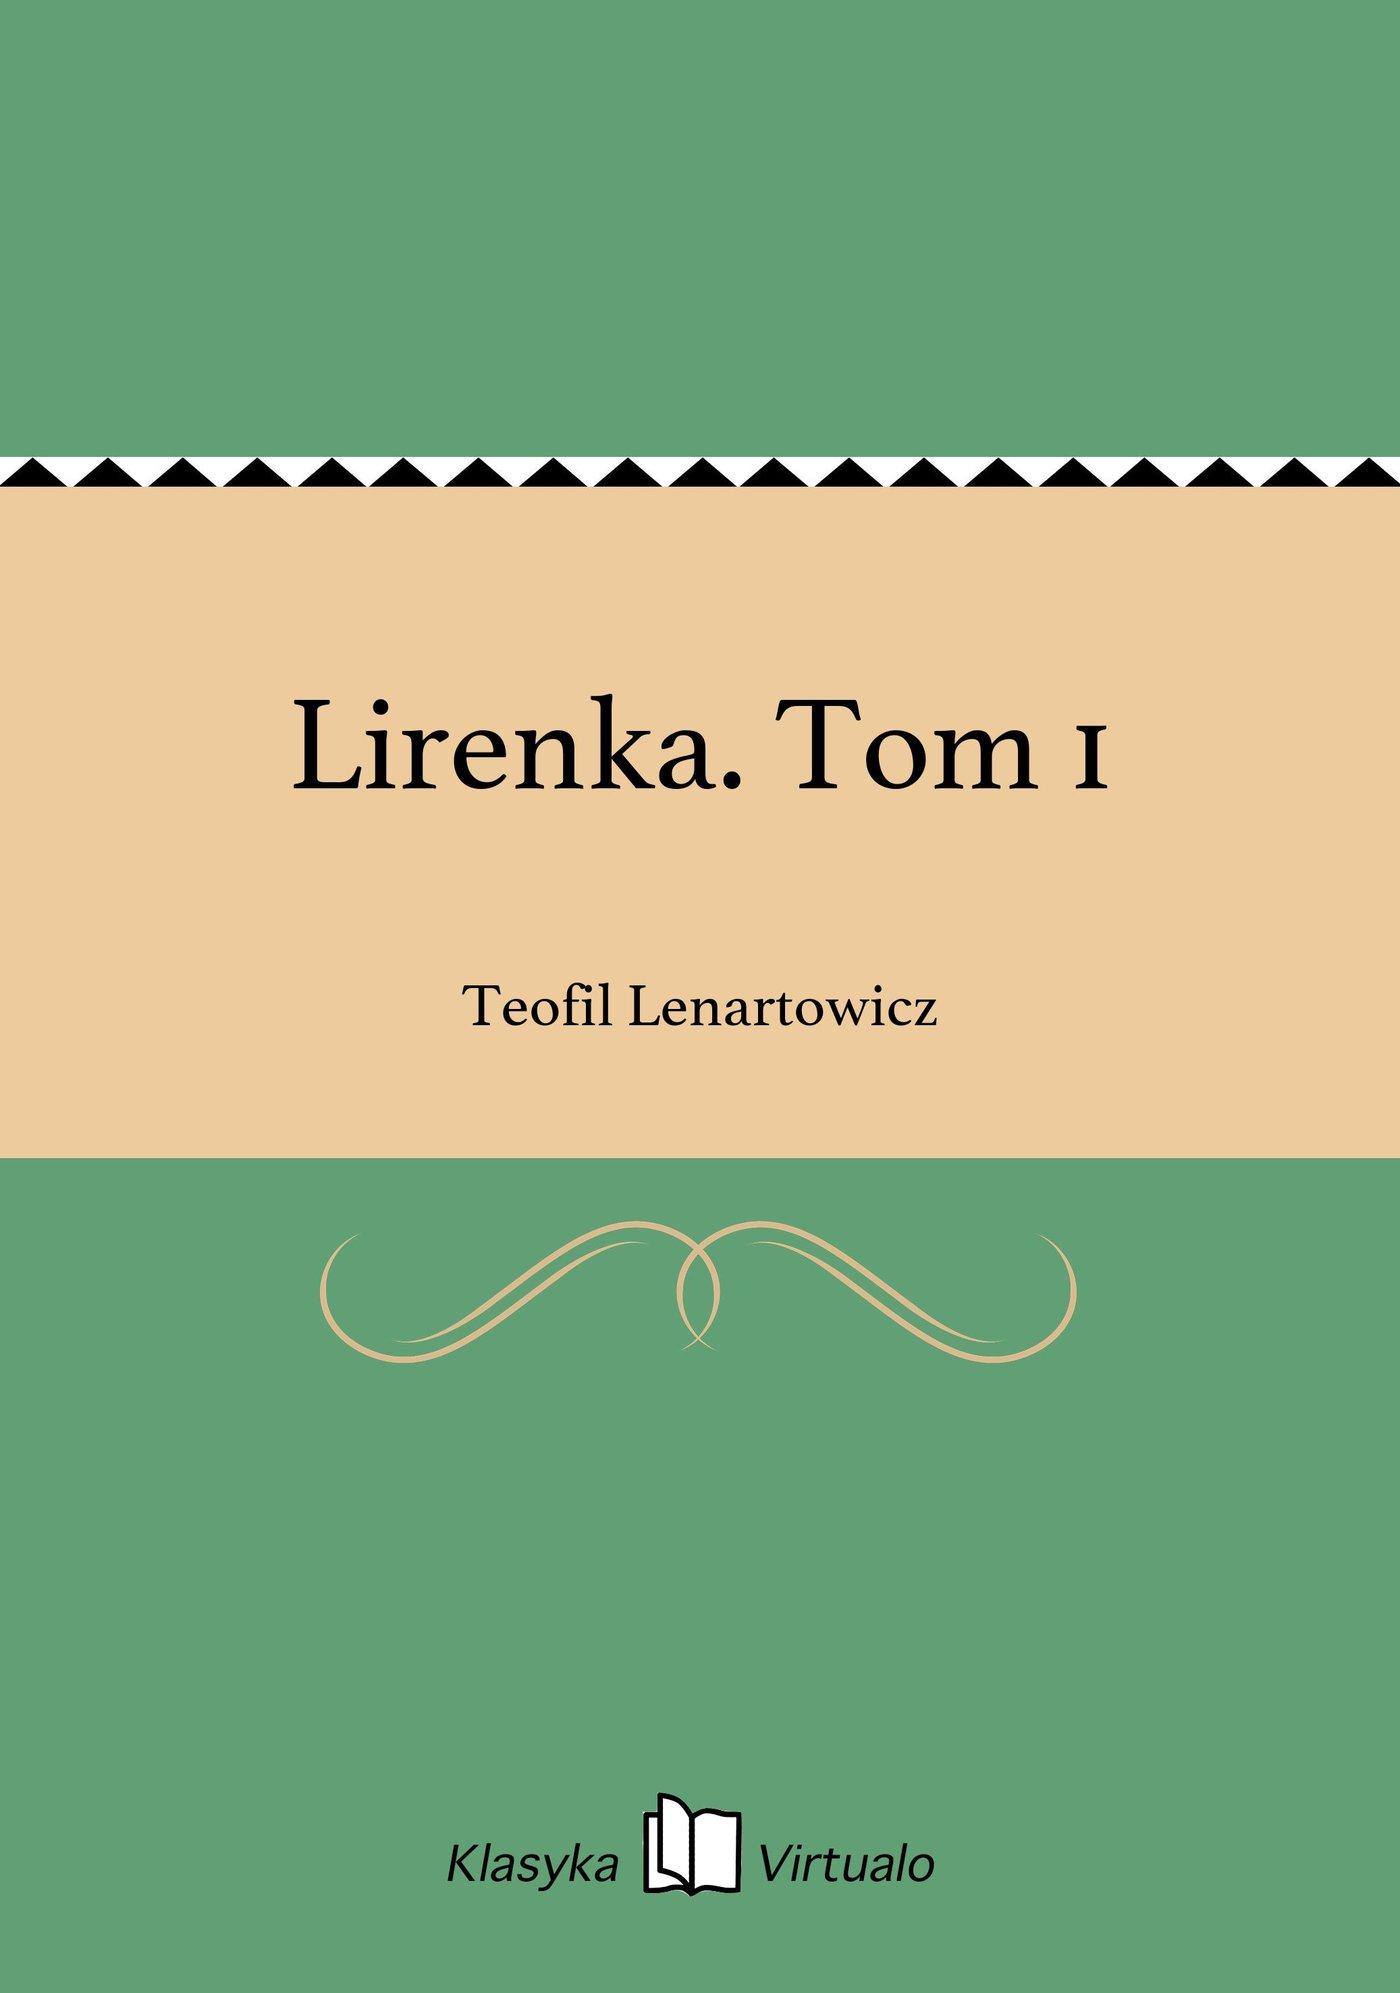 Lirenka. Tom 1 - Ebook (Książka na Kindle) do pobrania w formacie MOBI